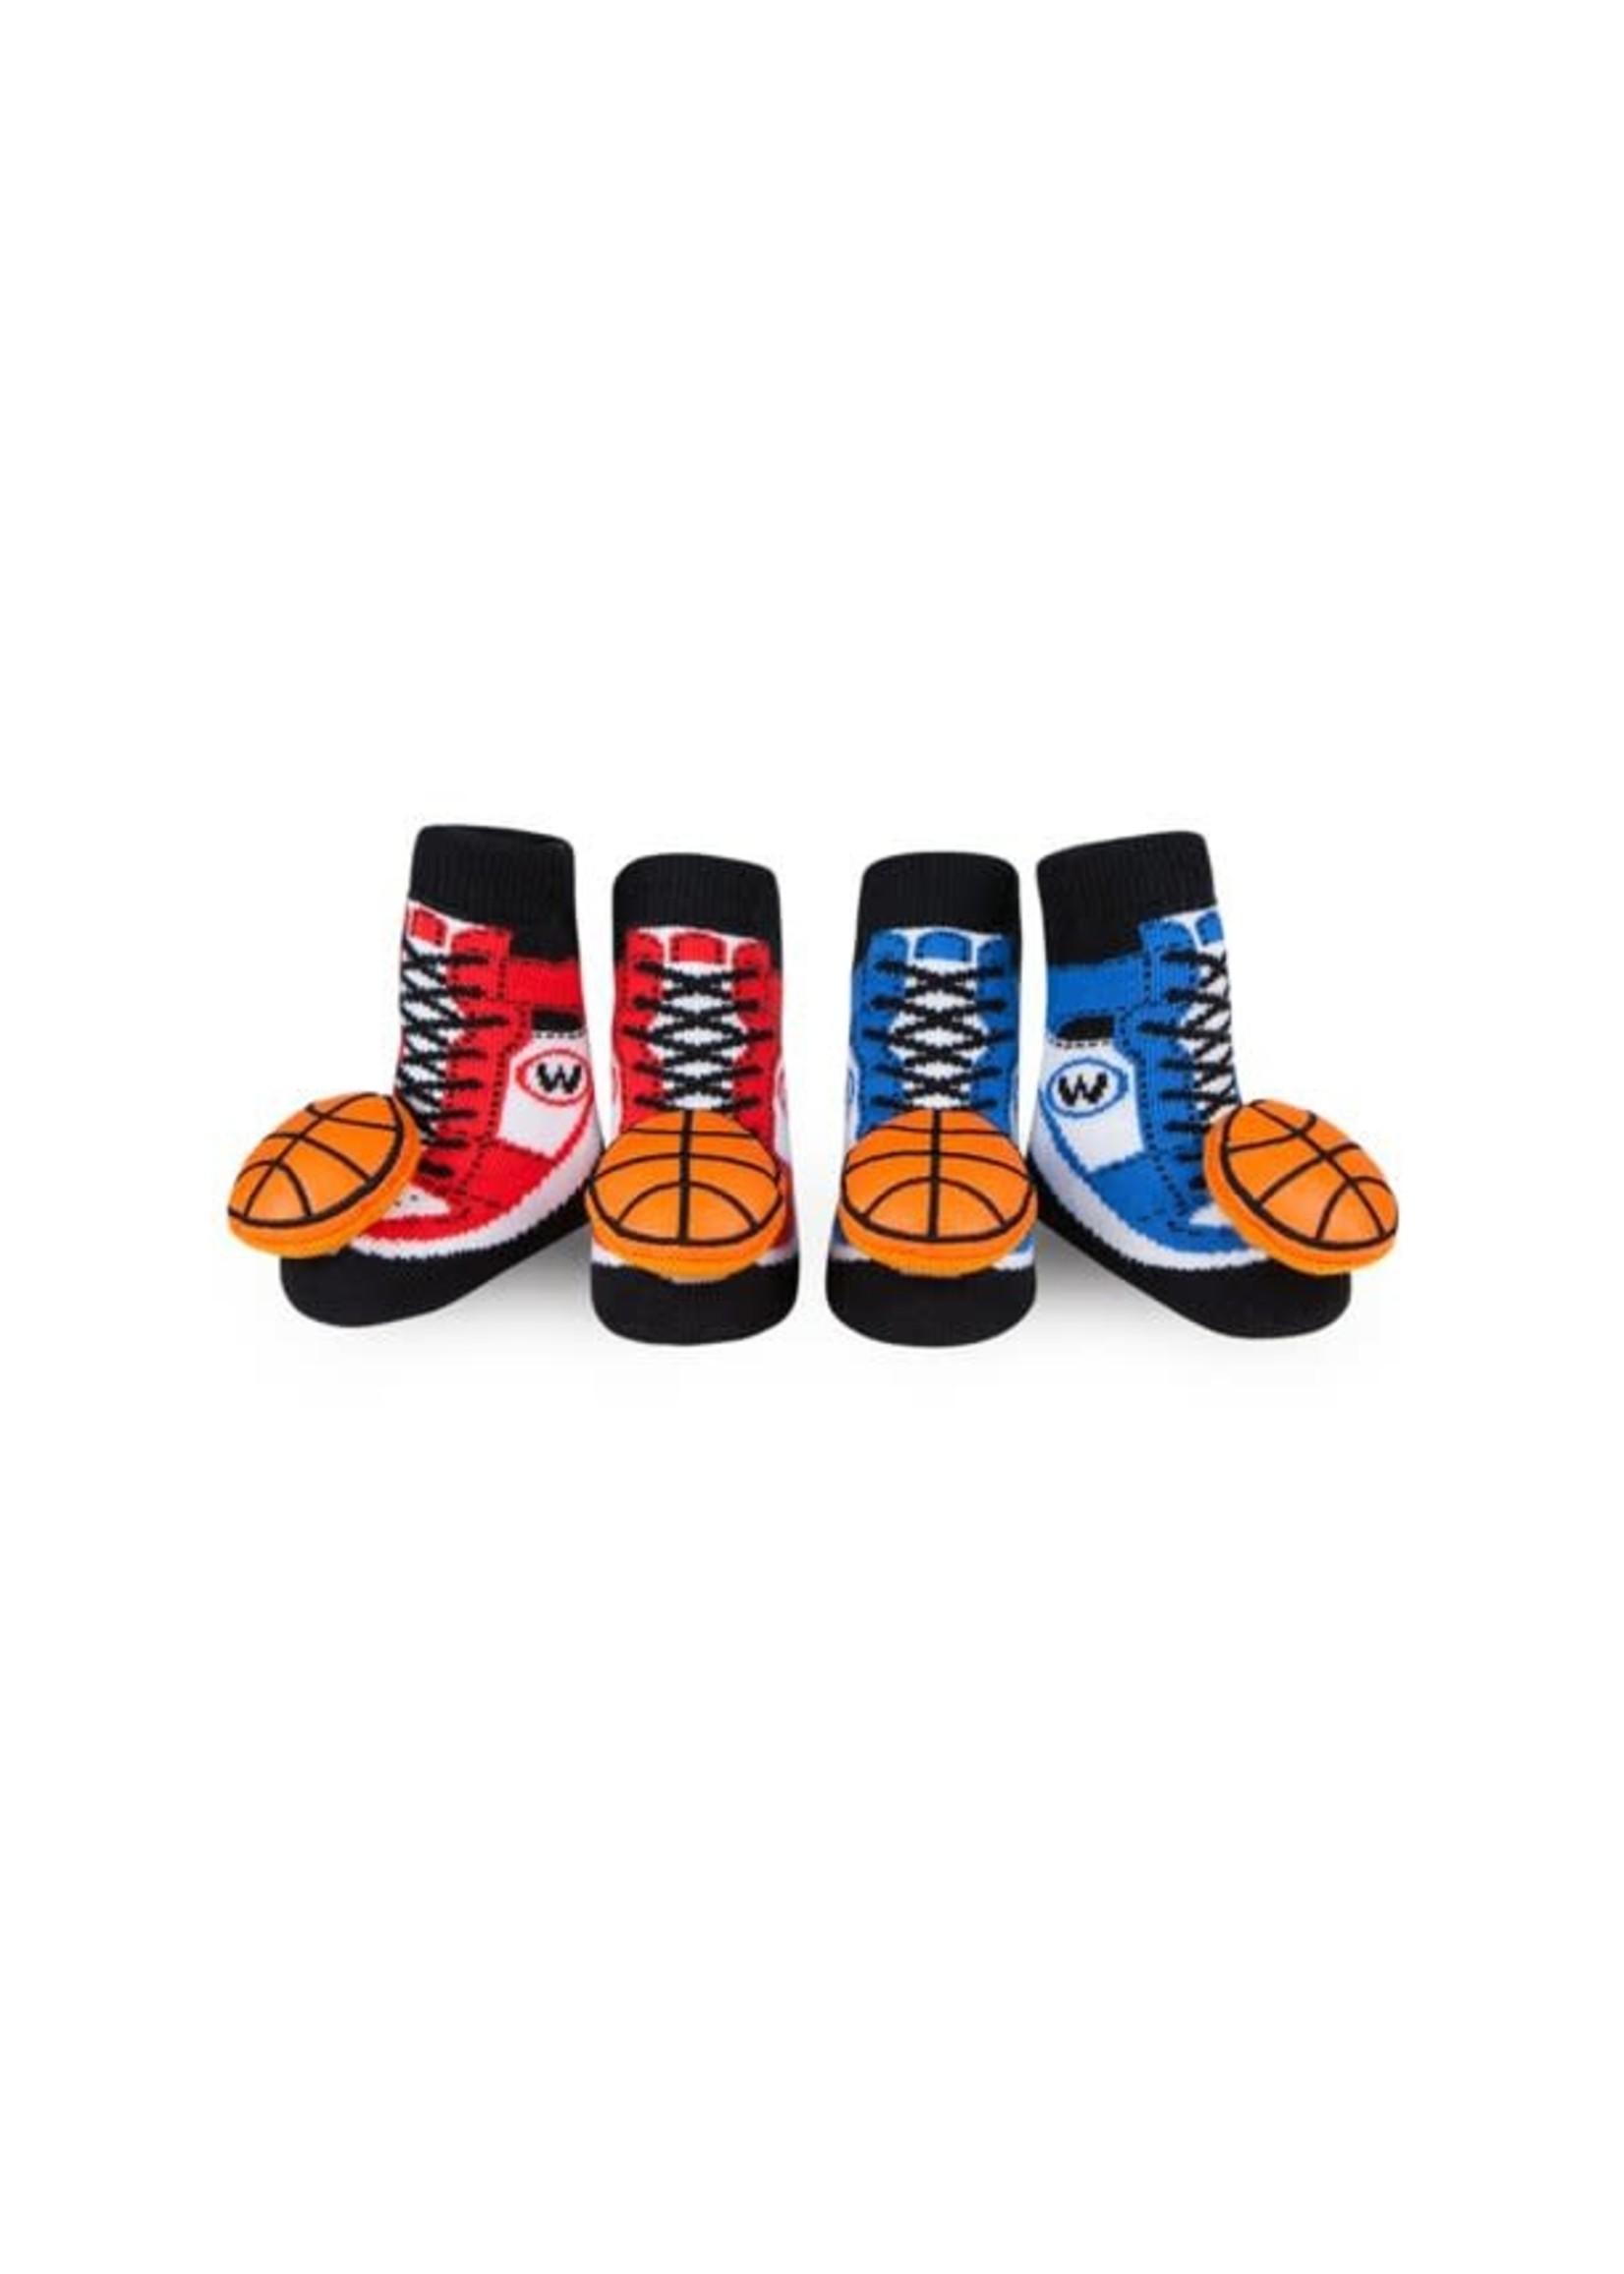 Waddle Rattle Socks